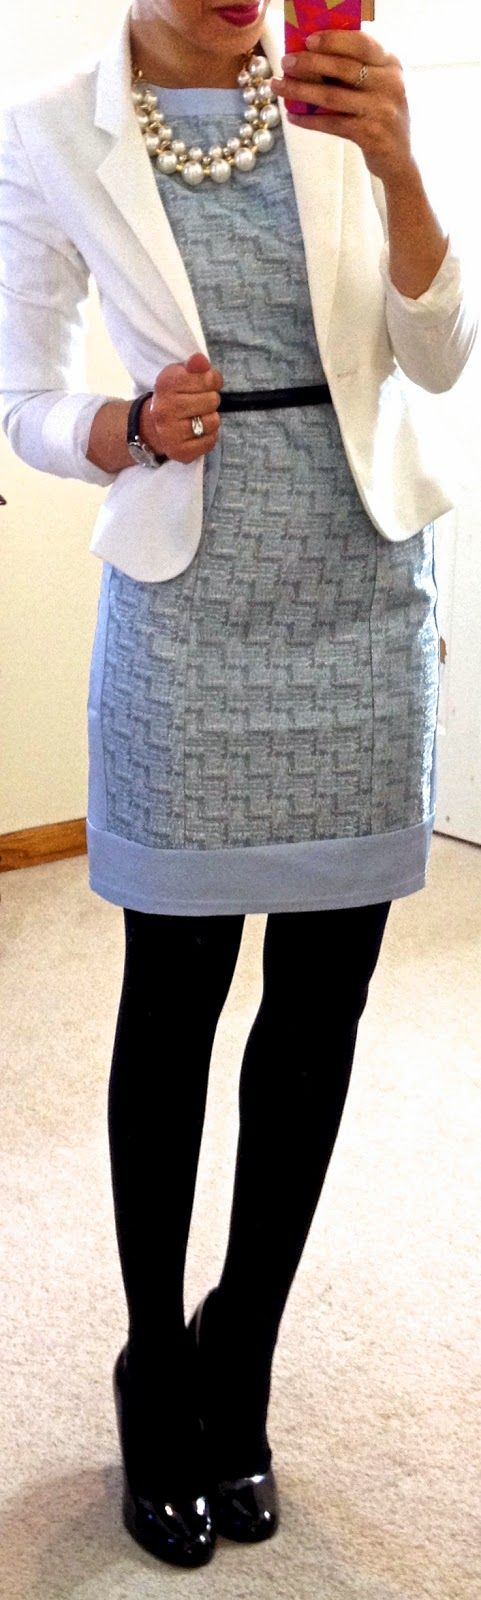 tweed sheath dress, blazer, & pearls.